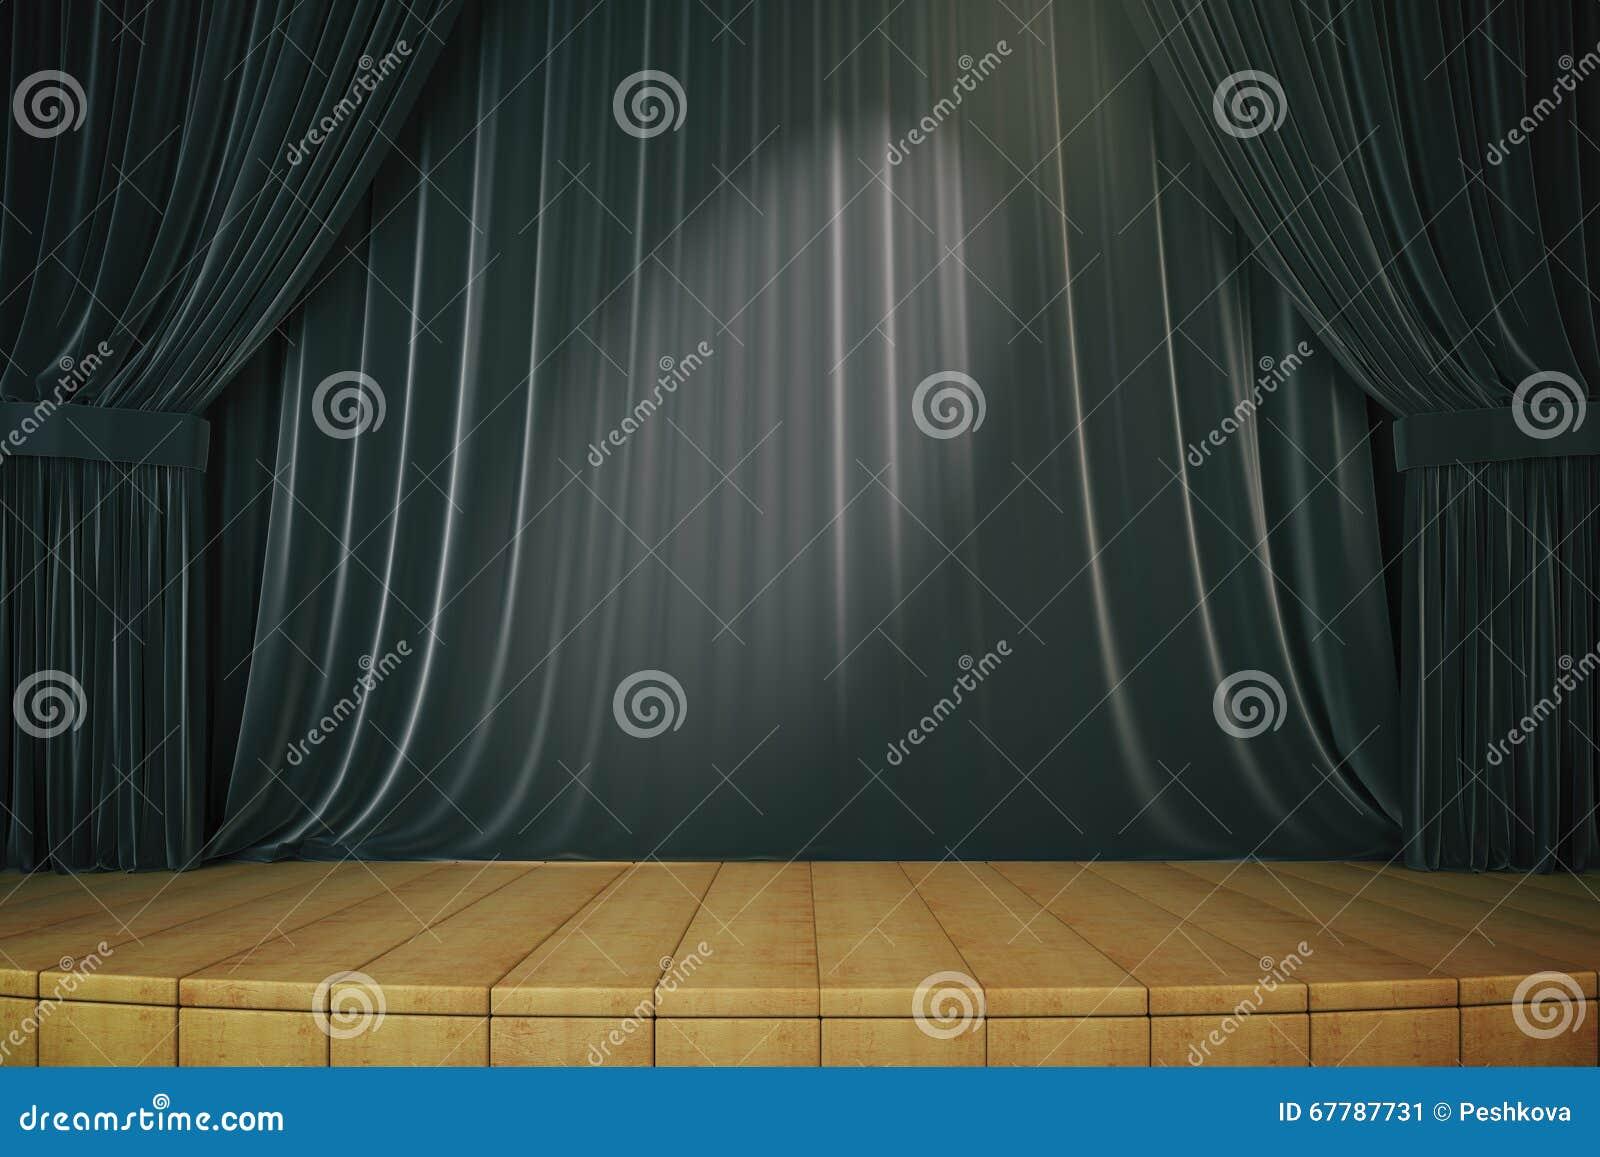 stage floor 3d - photo #44